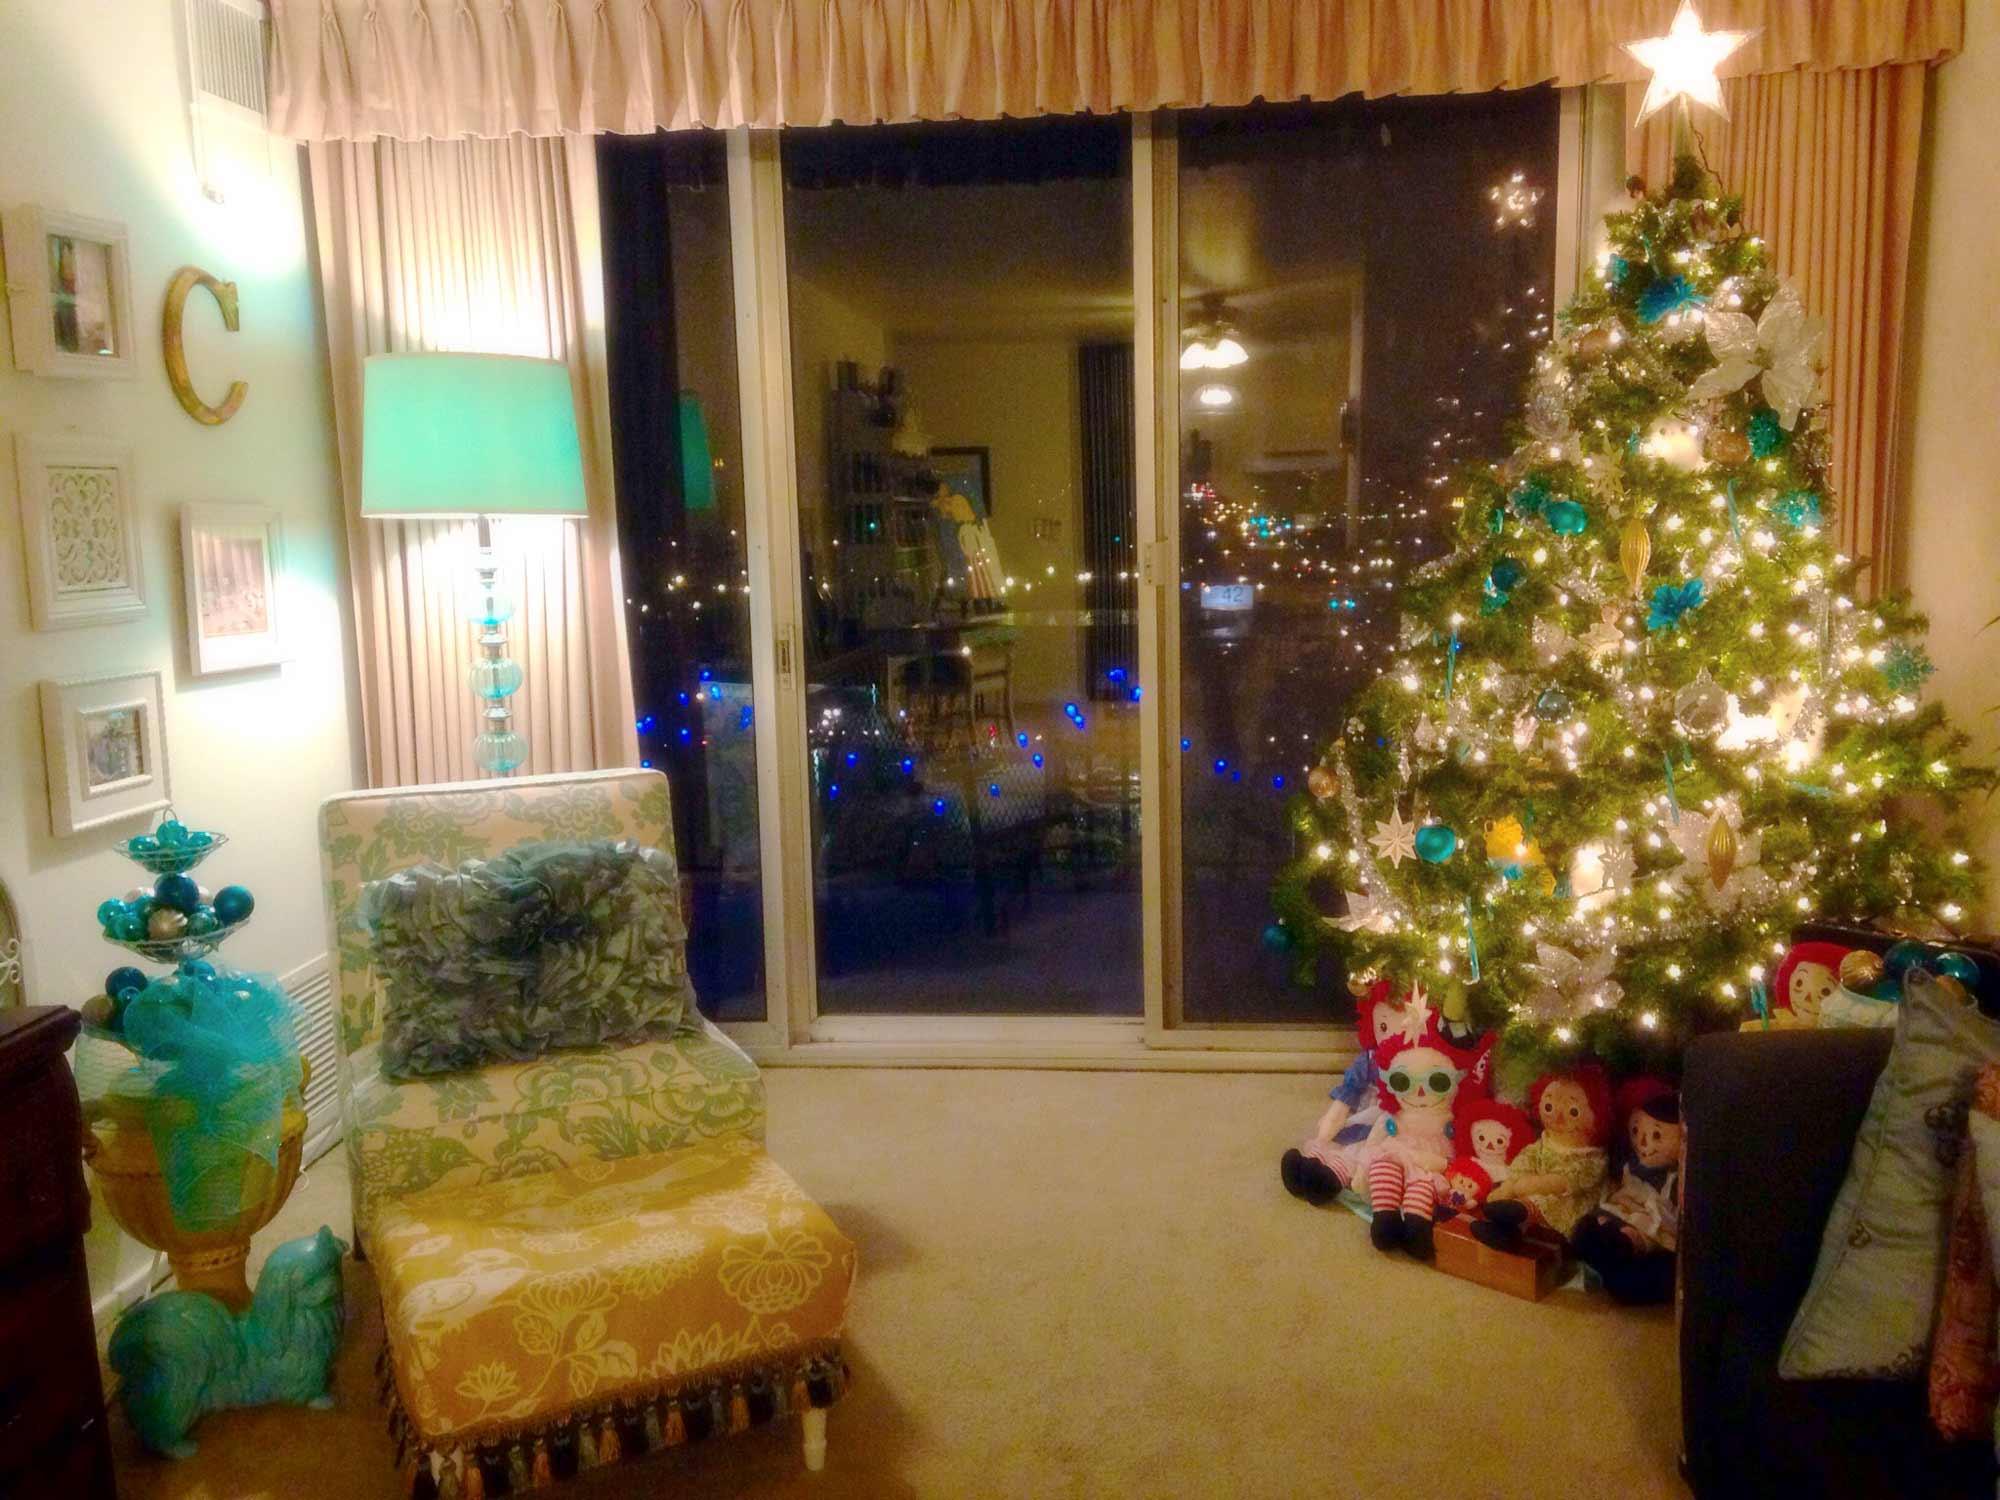 Groovy Condo 5 Year Anniversary - Christmas at the Condo